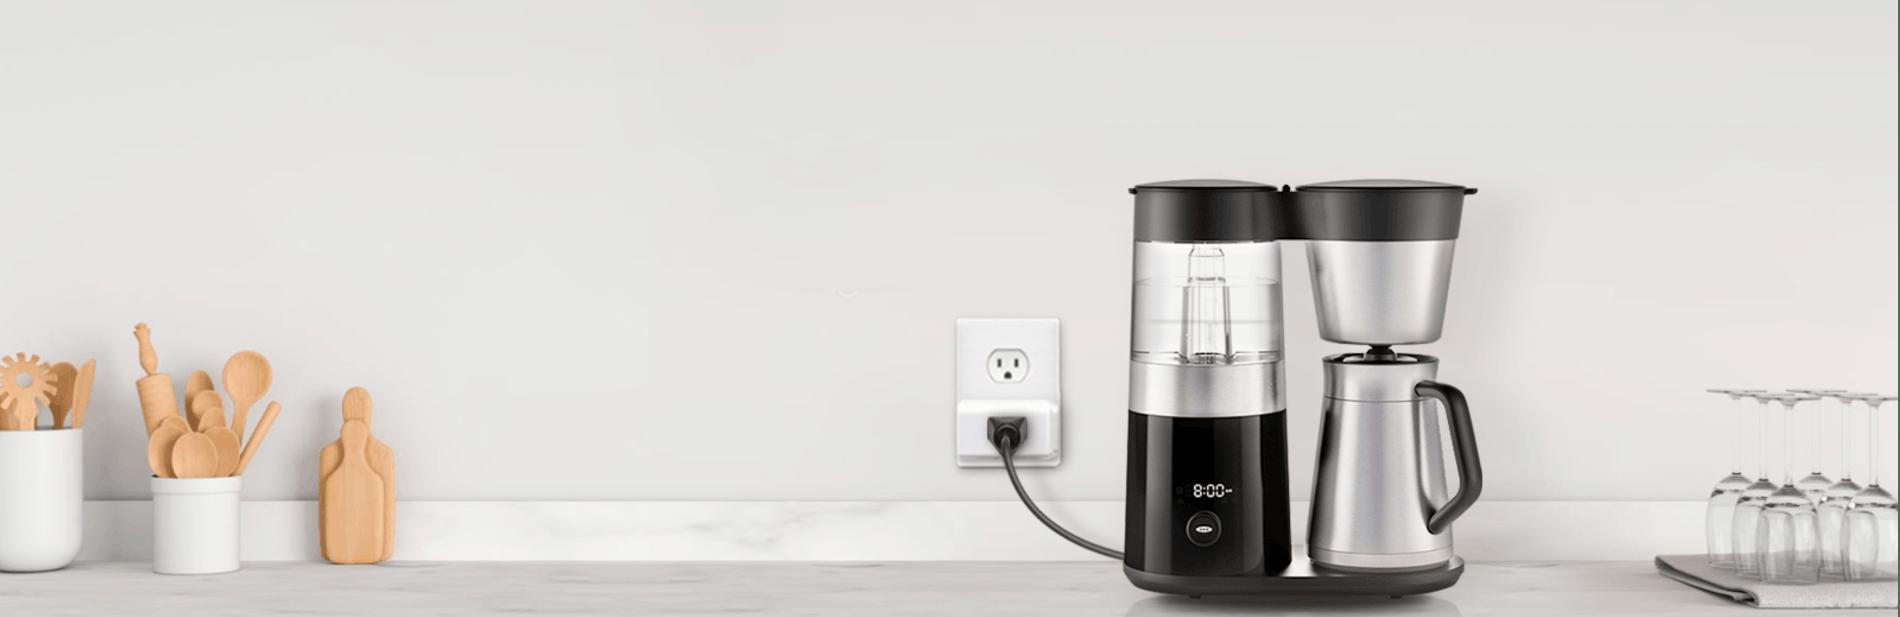 HS105 Wi-Fi Smart Plug